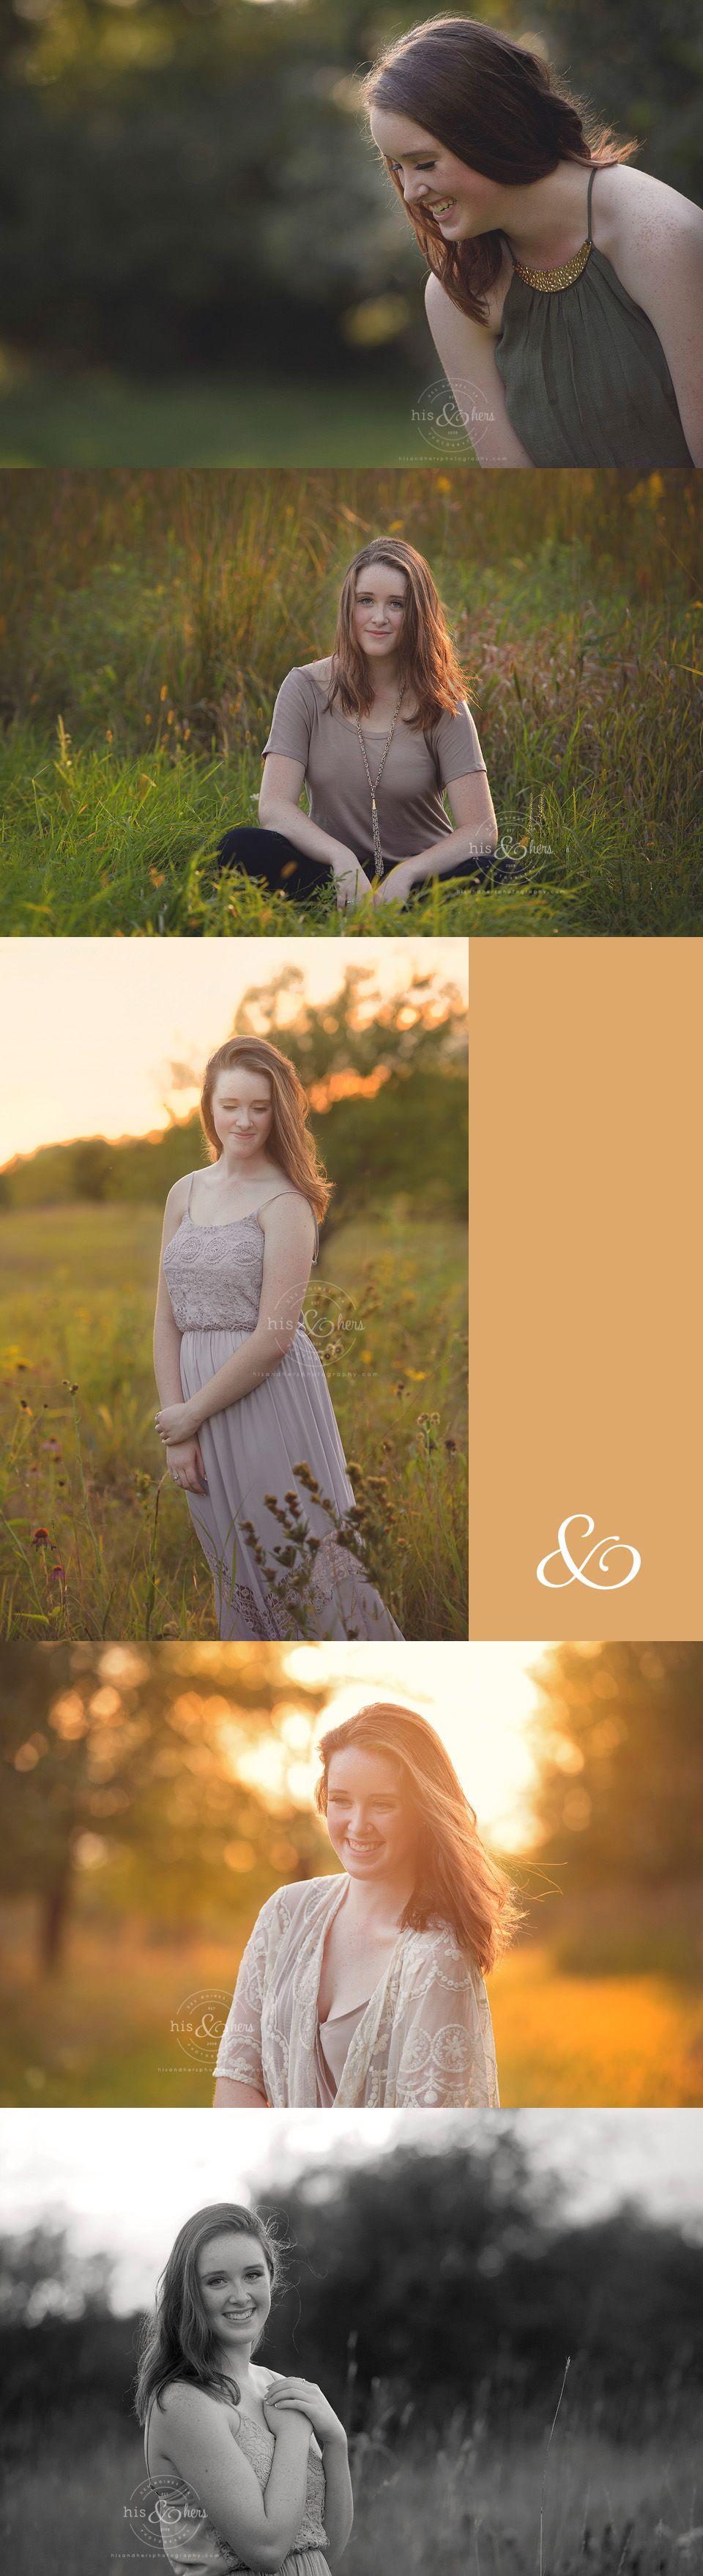 Senior | Claire, Class of 2015